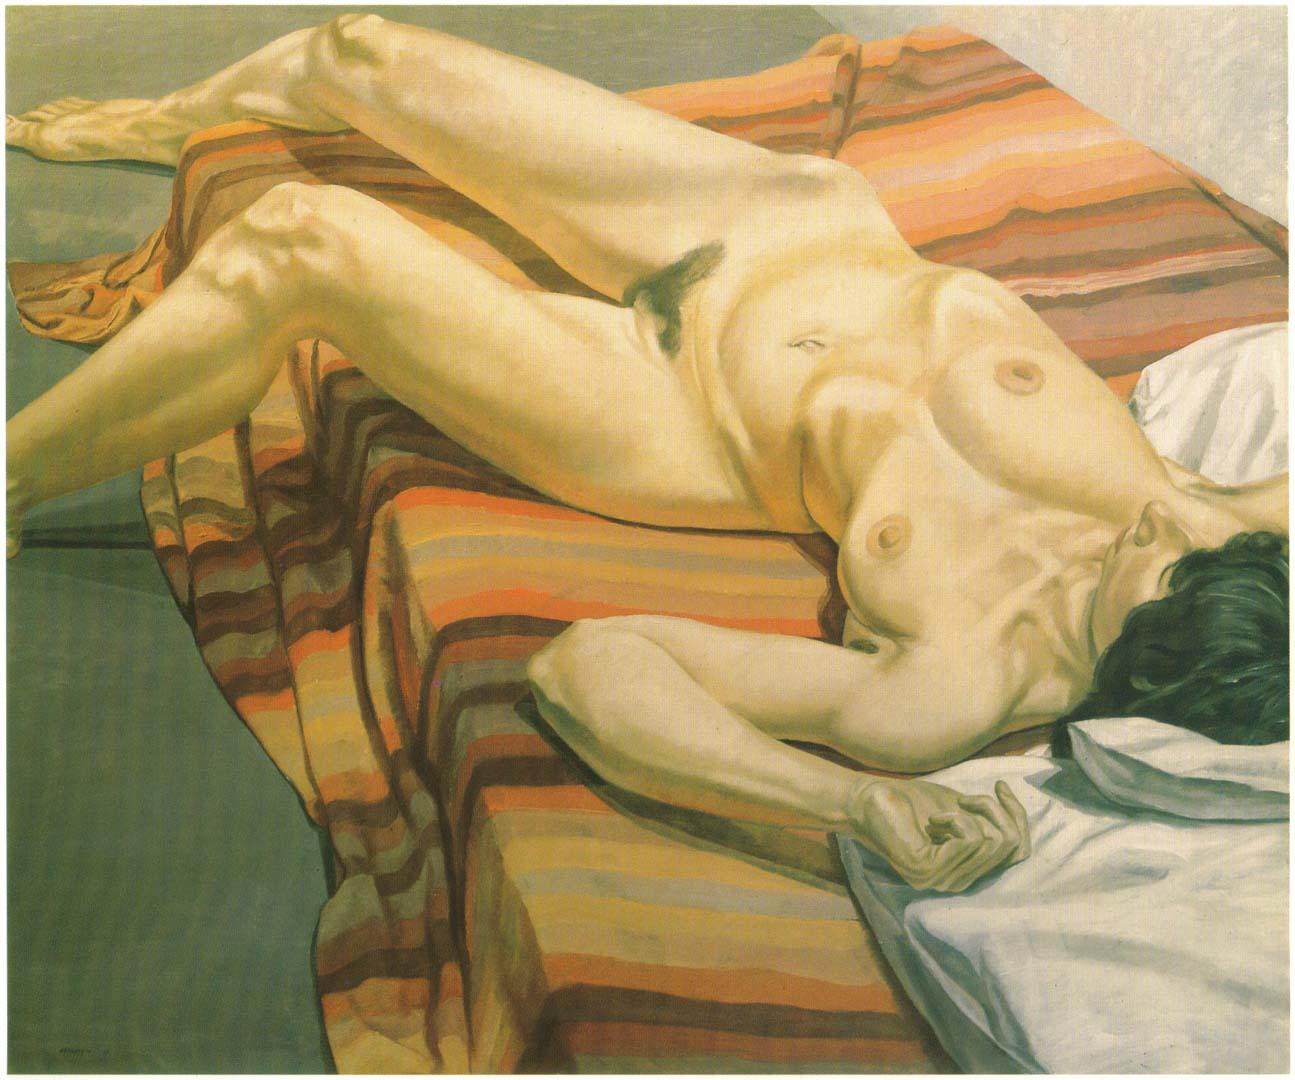 1967 Nude on Striped Drape Oil on Canvas 60 x 72